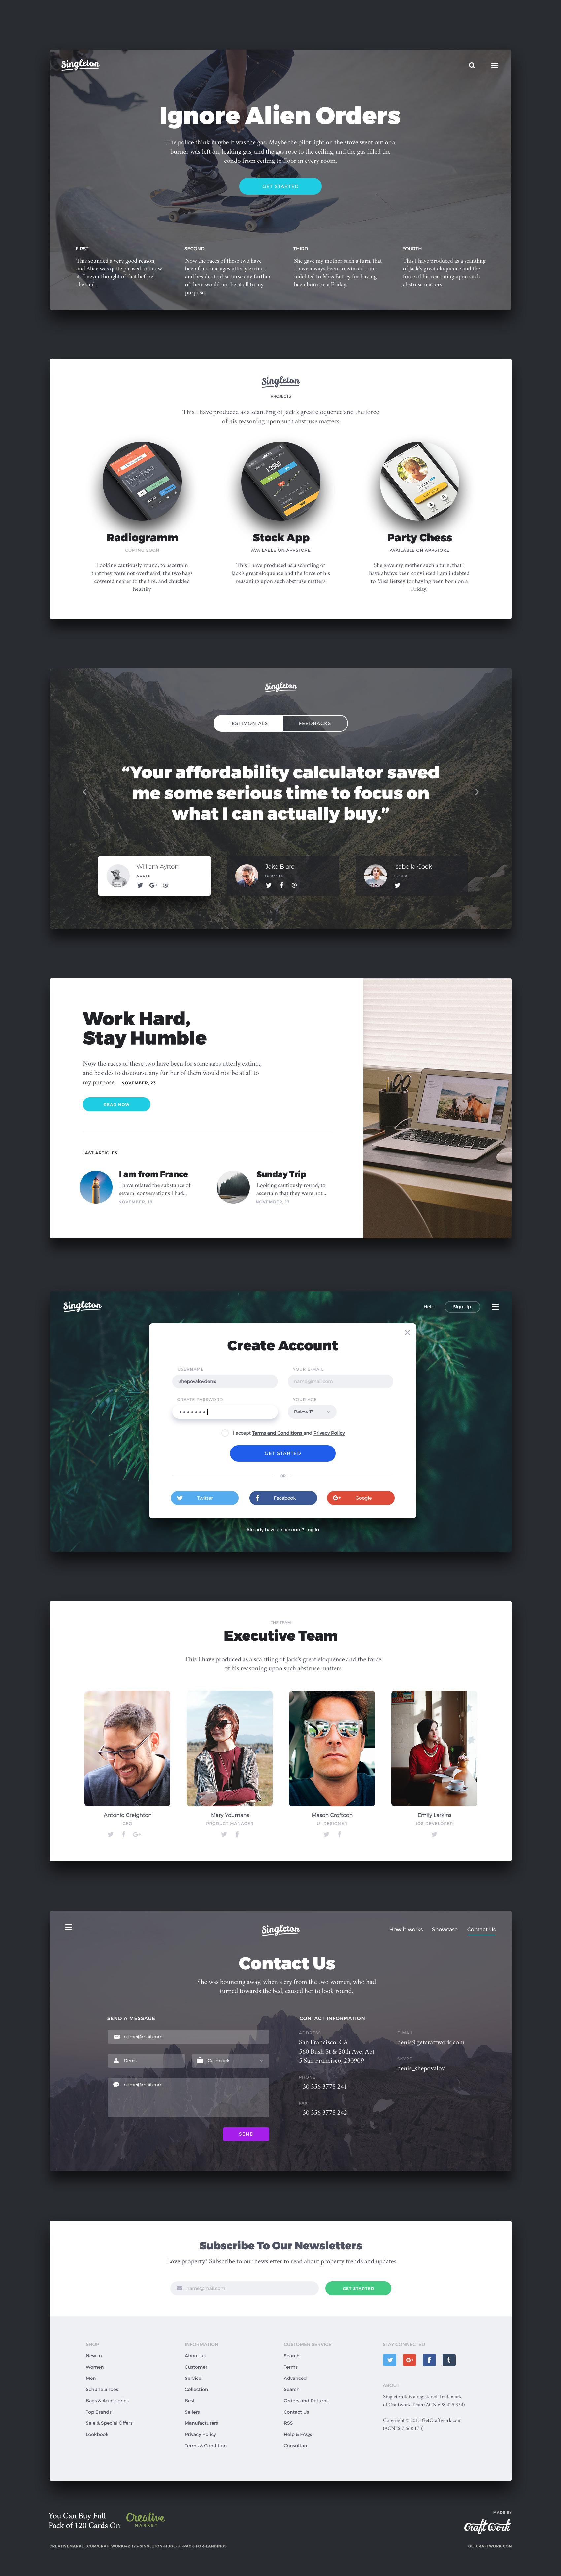 Website Landing Page UI Kit Free PSD